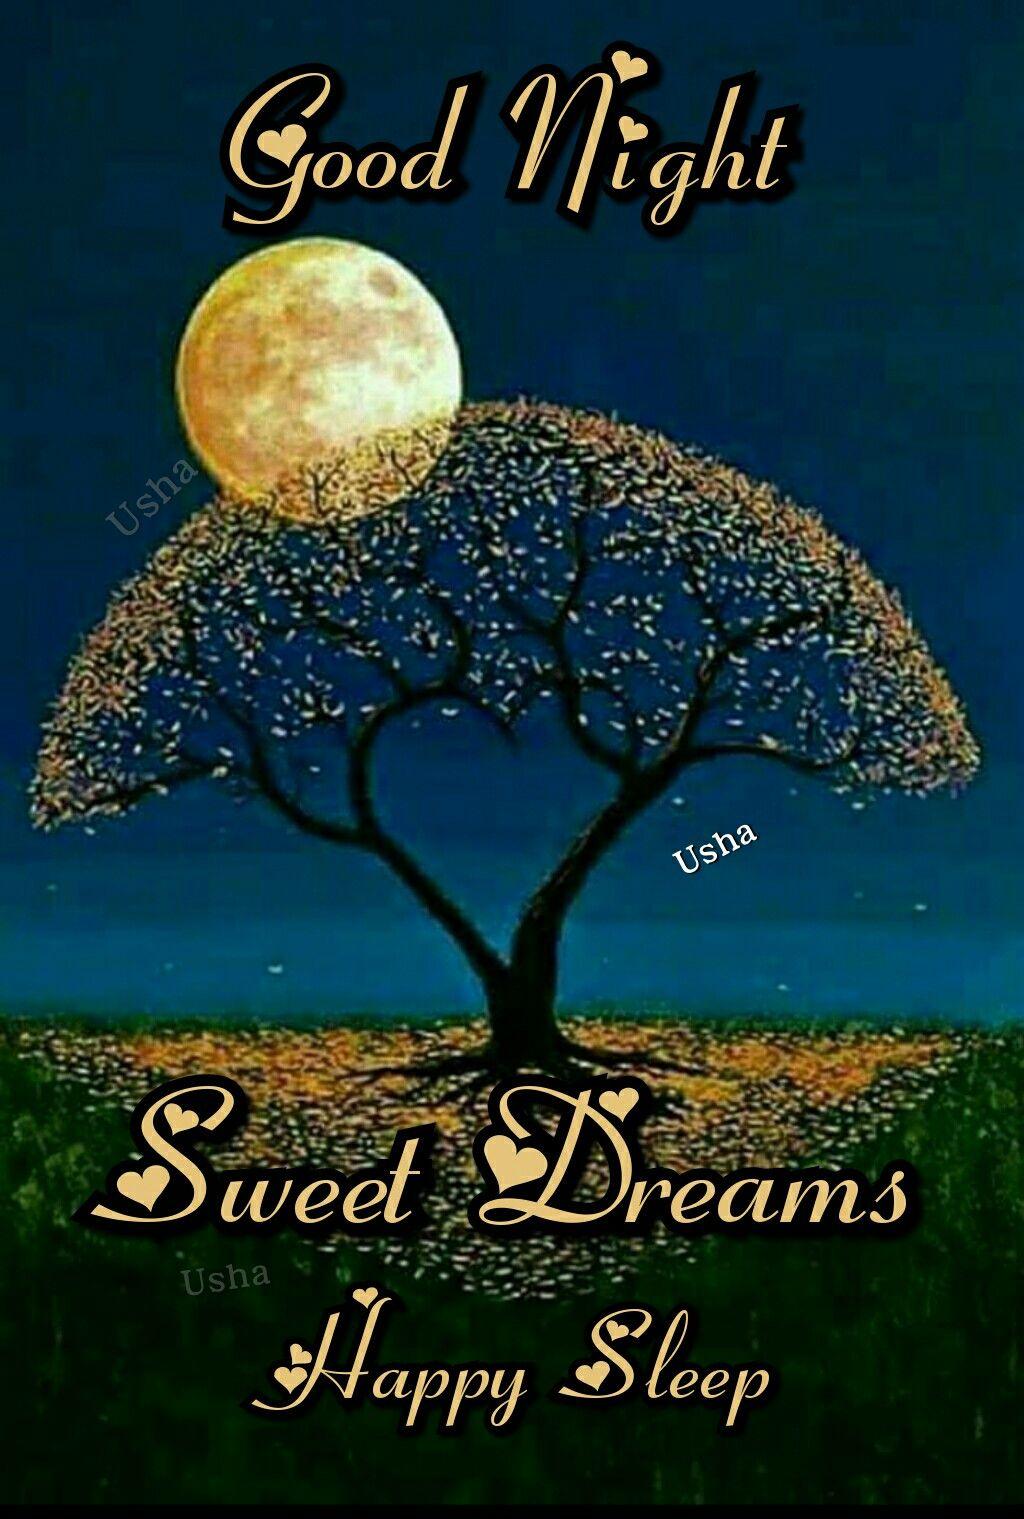 Goodnight Good Night Image Romantic Good Night Good Night Wallpaper